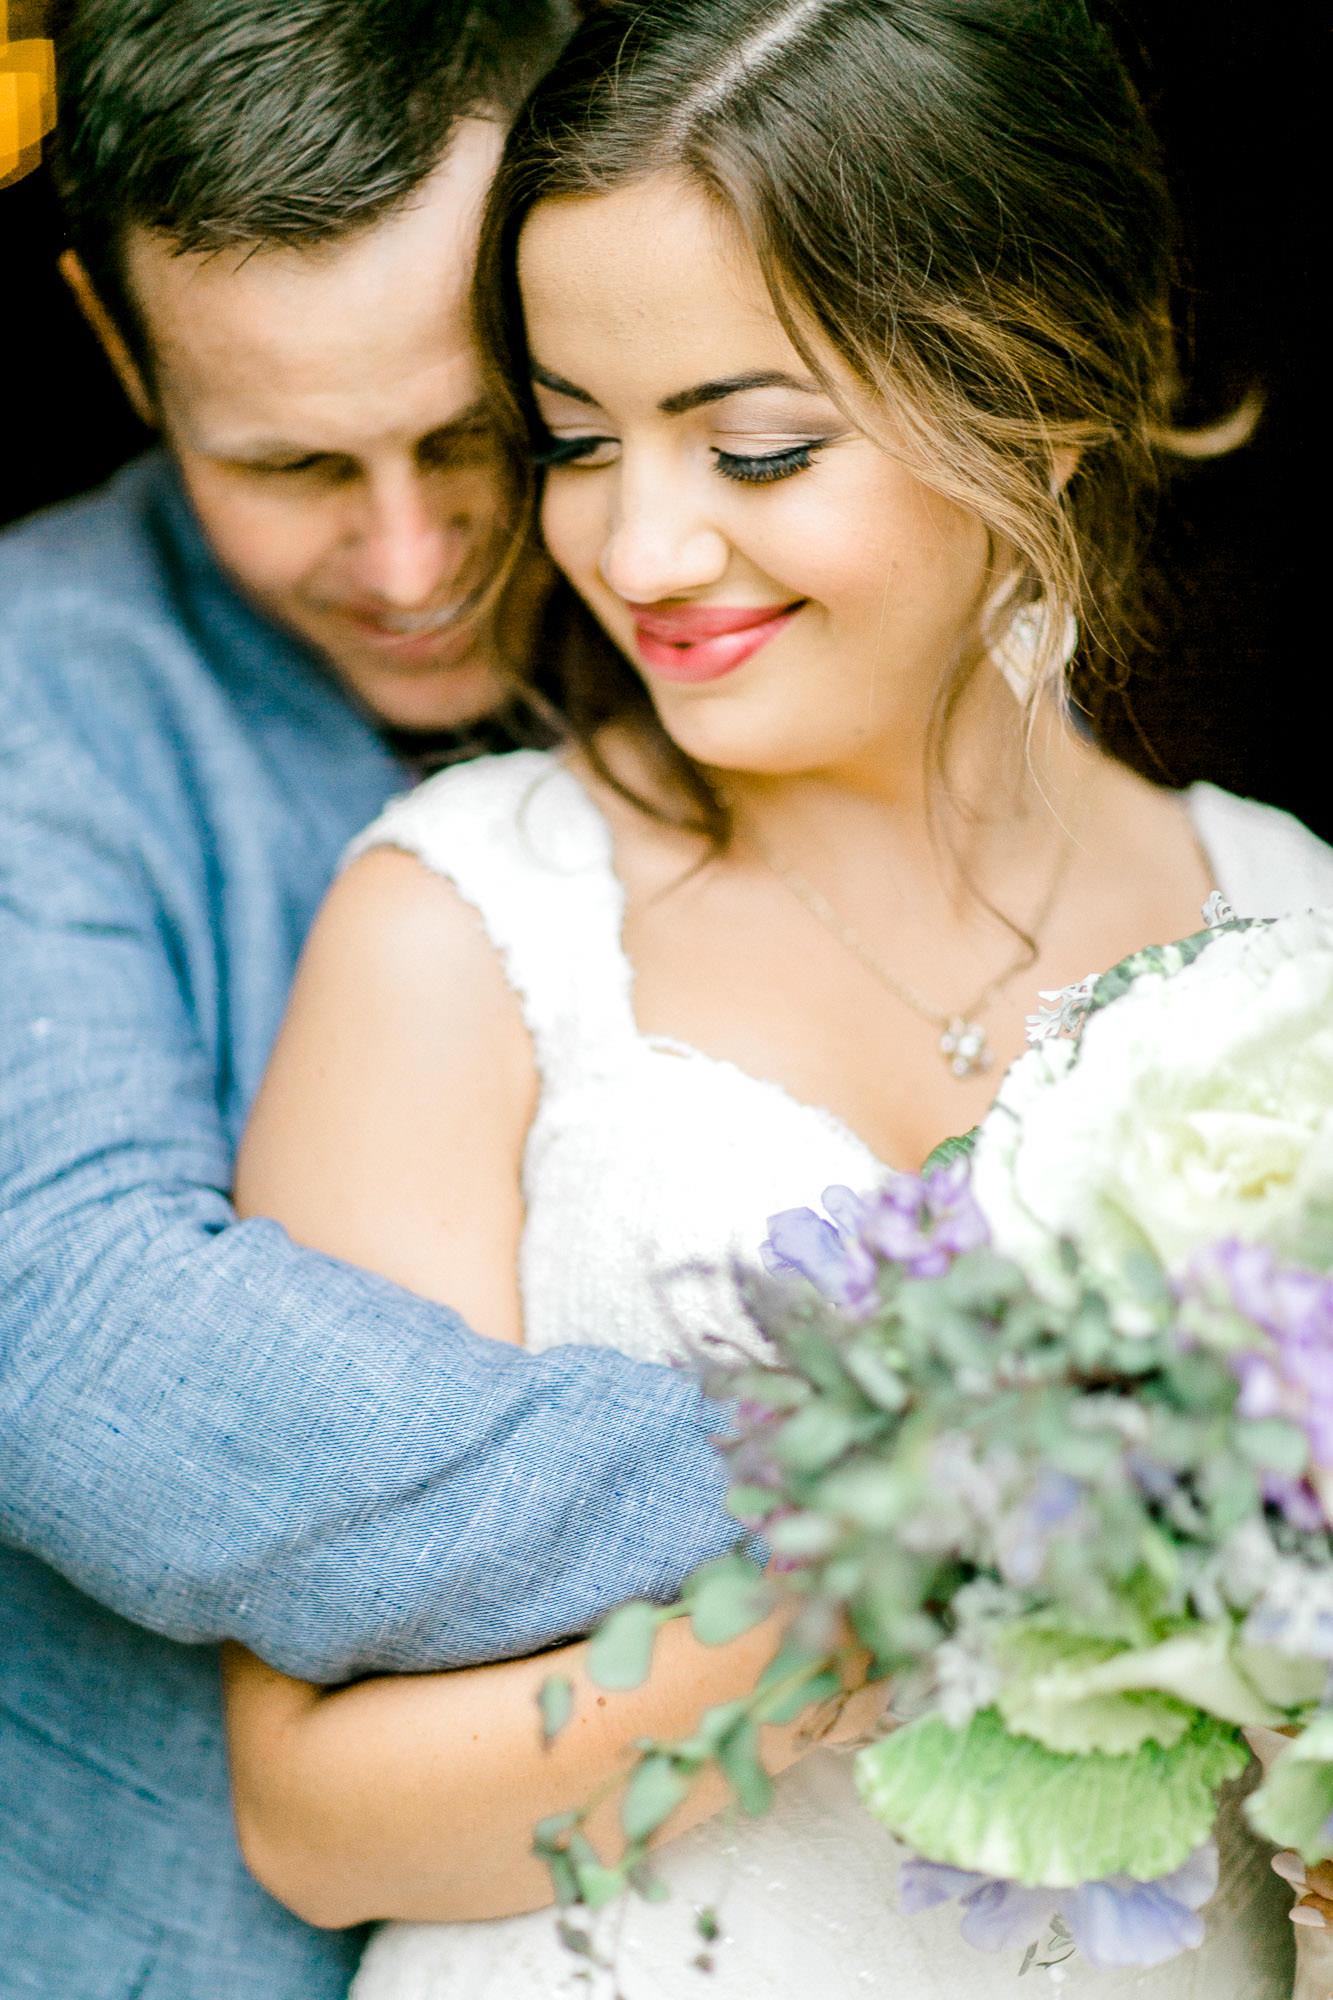 alexis-joel-laury-lubbock-weddingphotographer-alleej0033.jpg